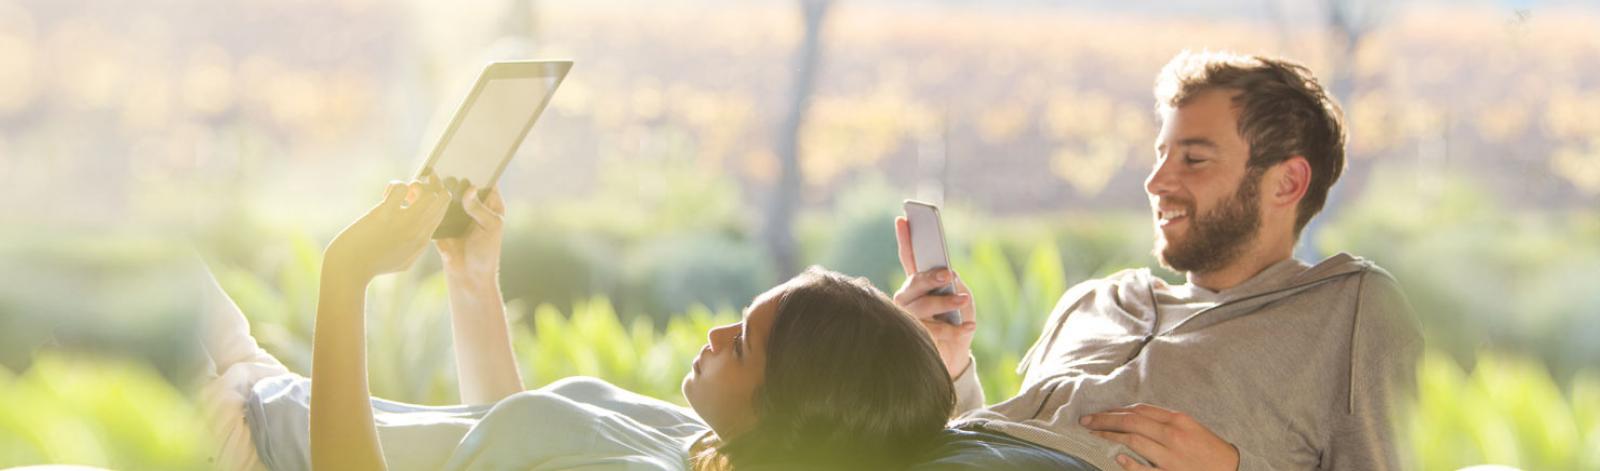 telecharger app